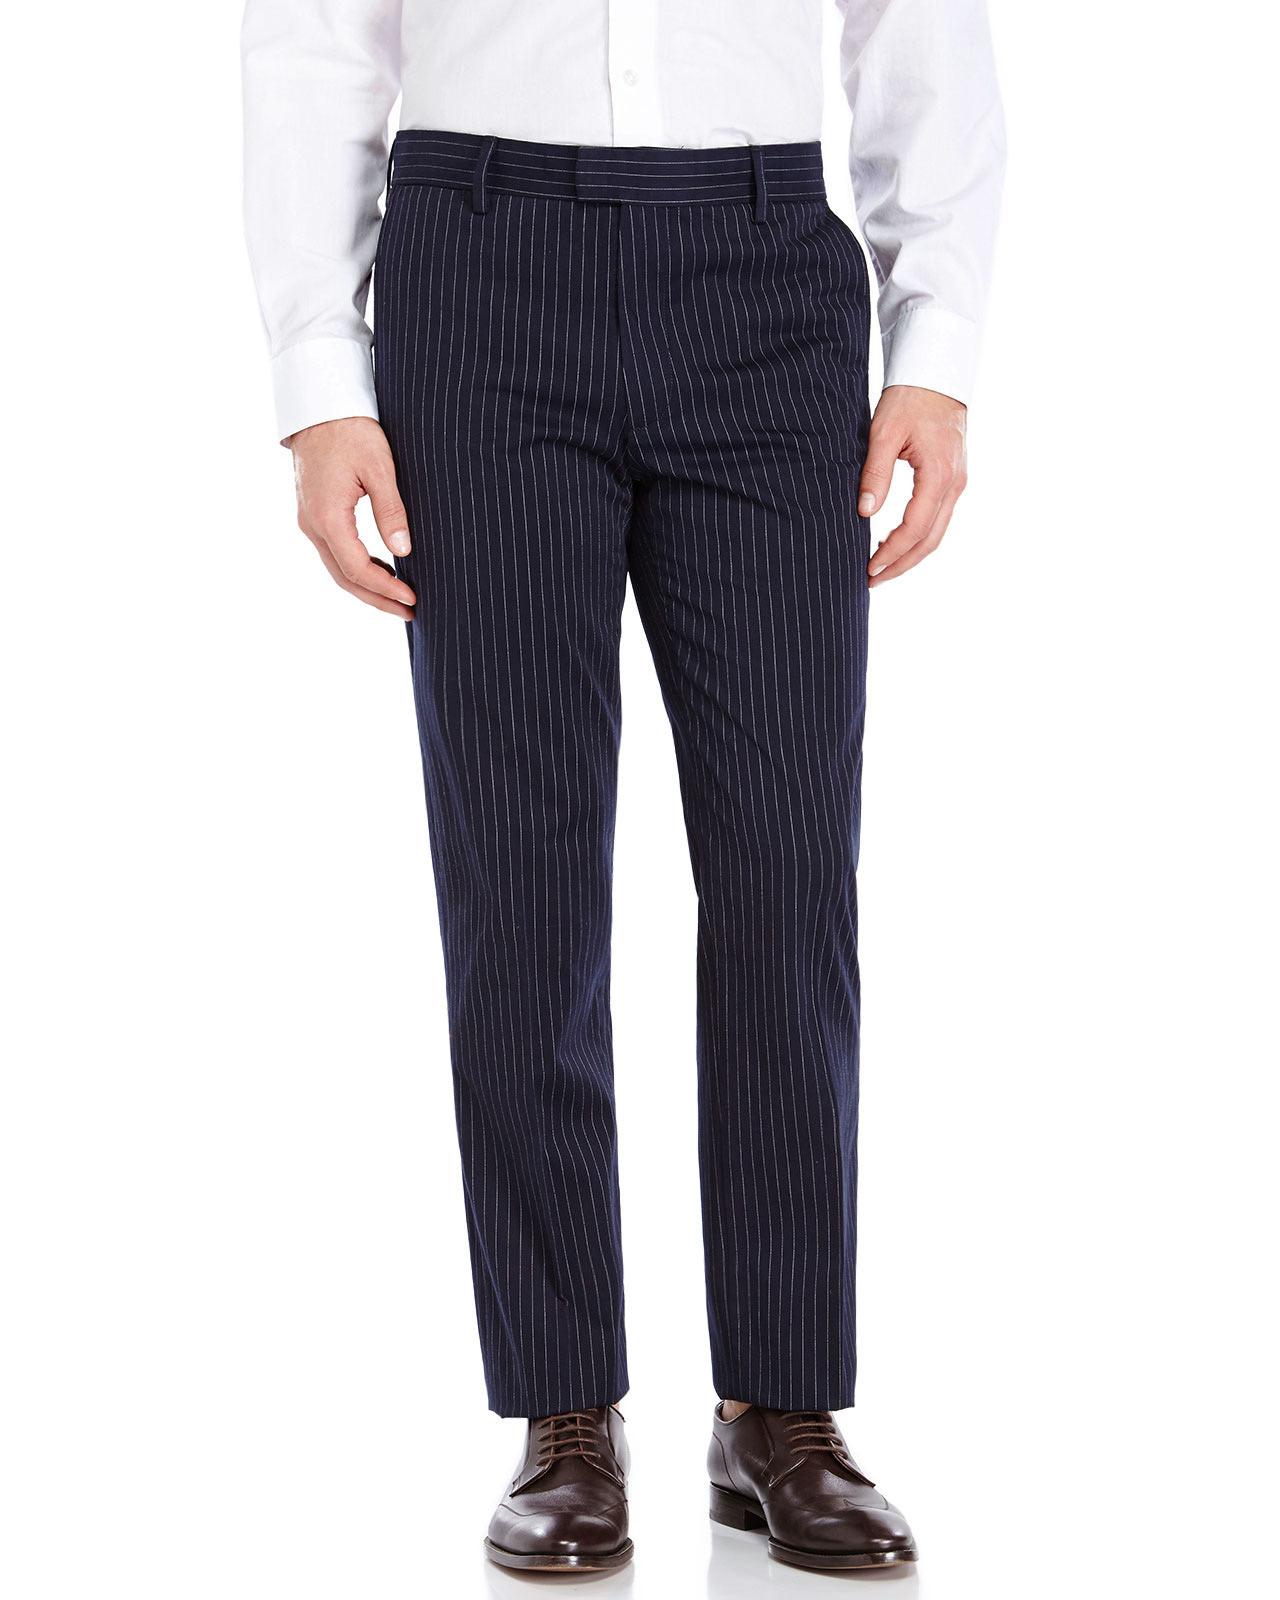 Fantastic NEW NWT Old Navy Womens Gray Dress Pants Slacks Size 10 Fall Winter | EBay